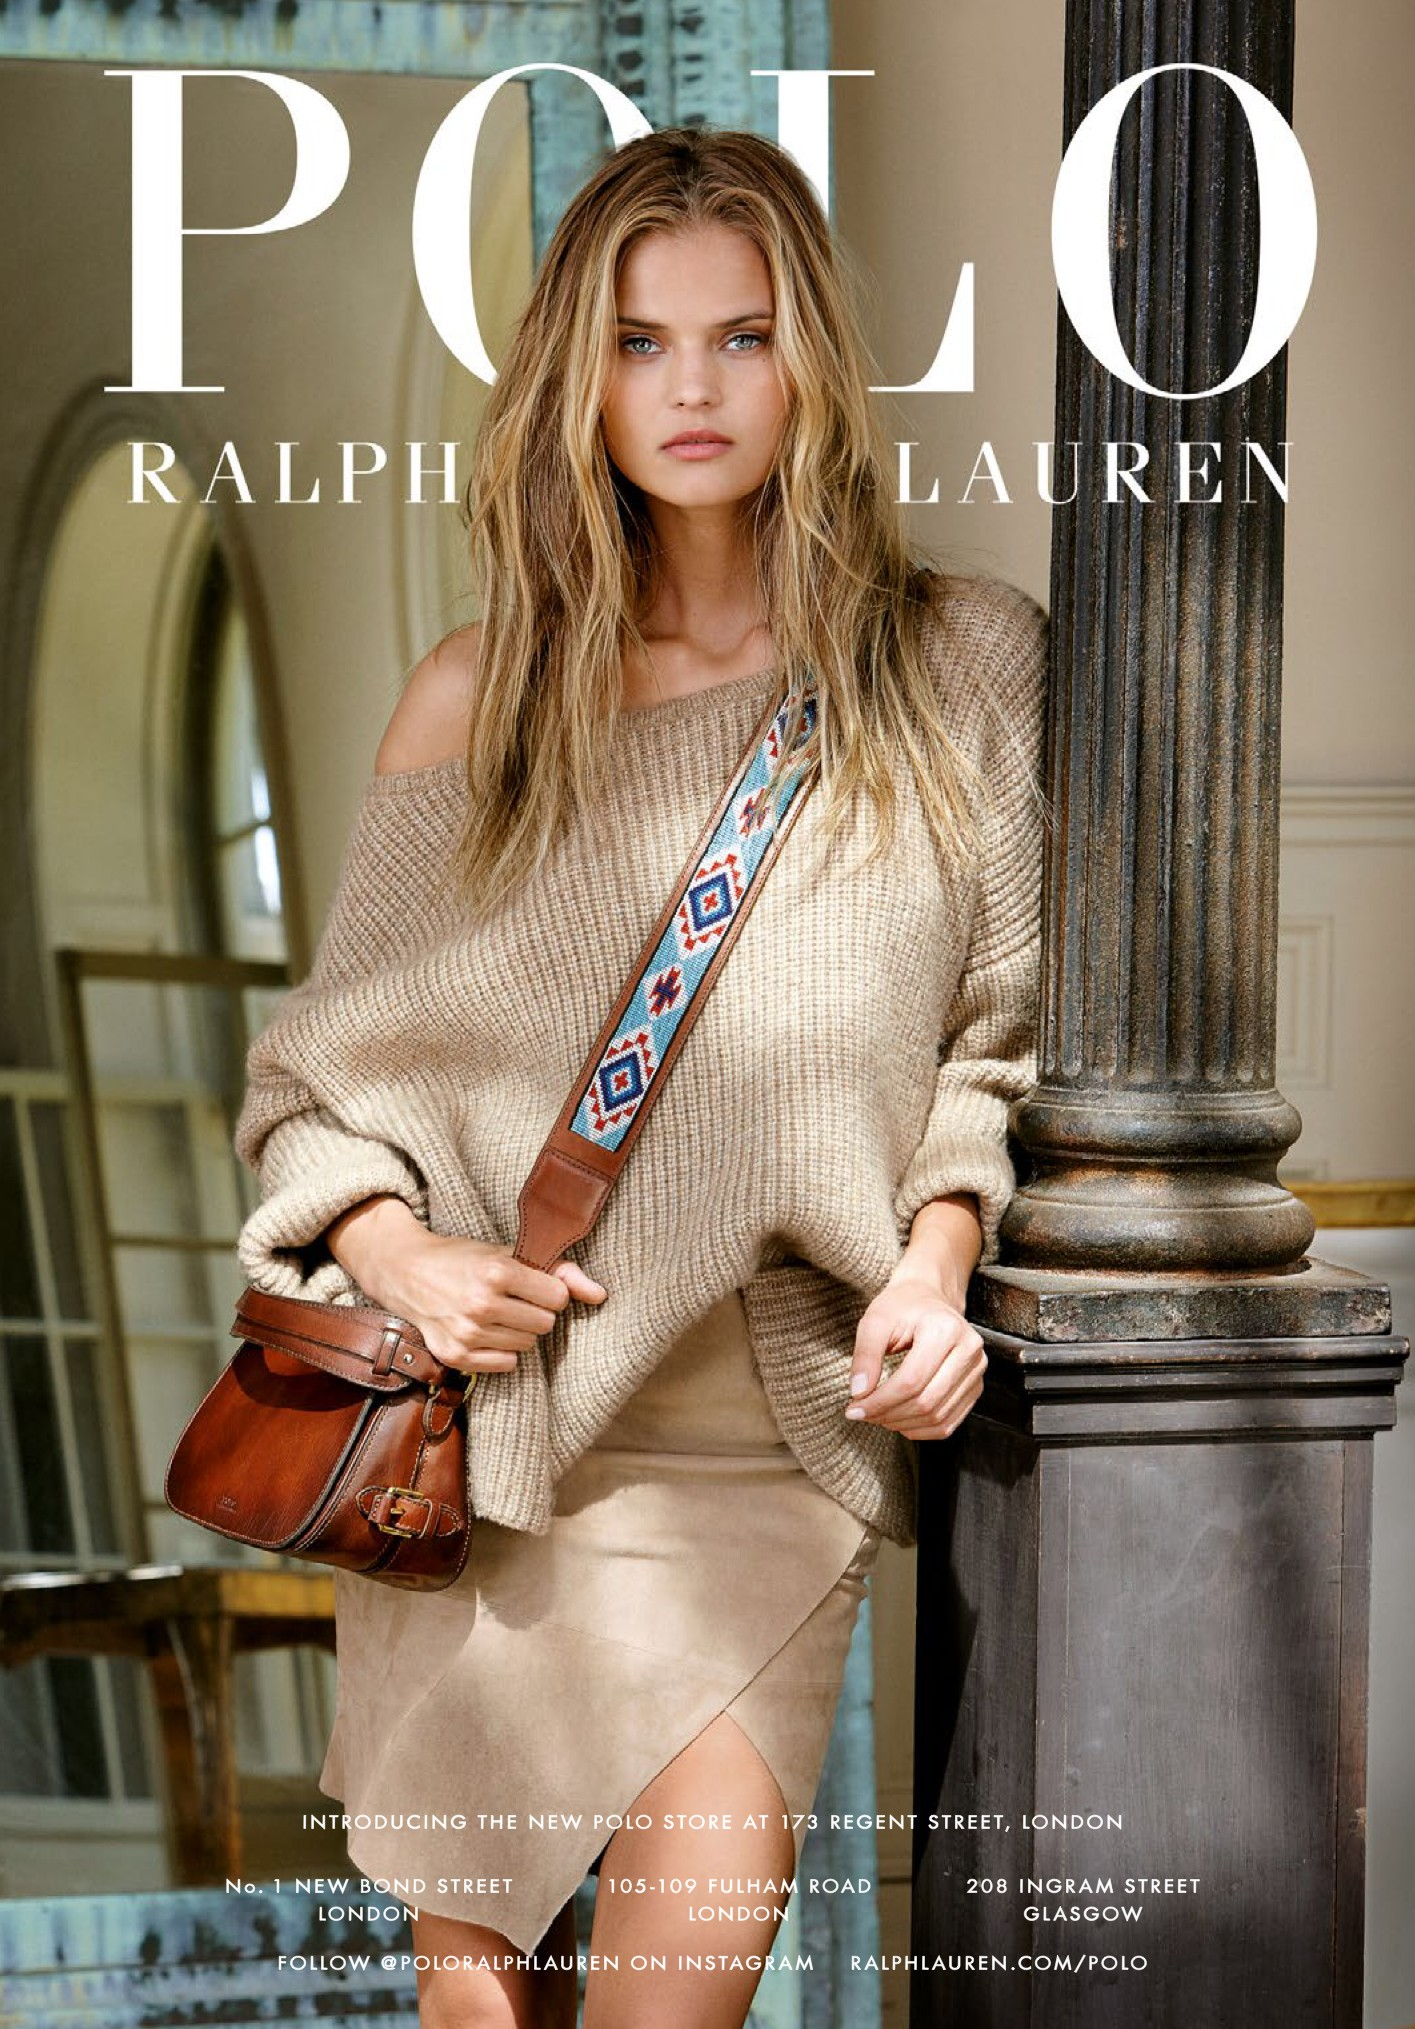 Lauren Bellazon Model Id Ralph Polo bgyf76